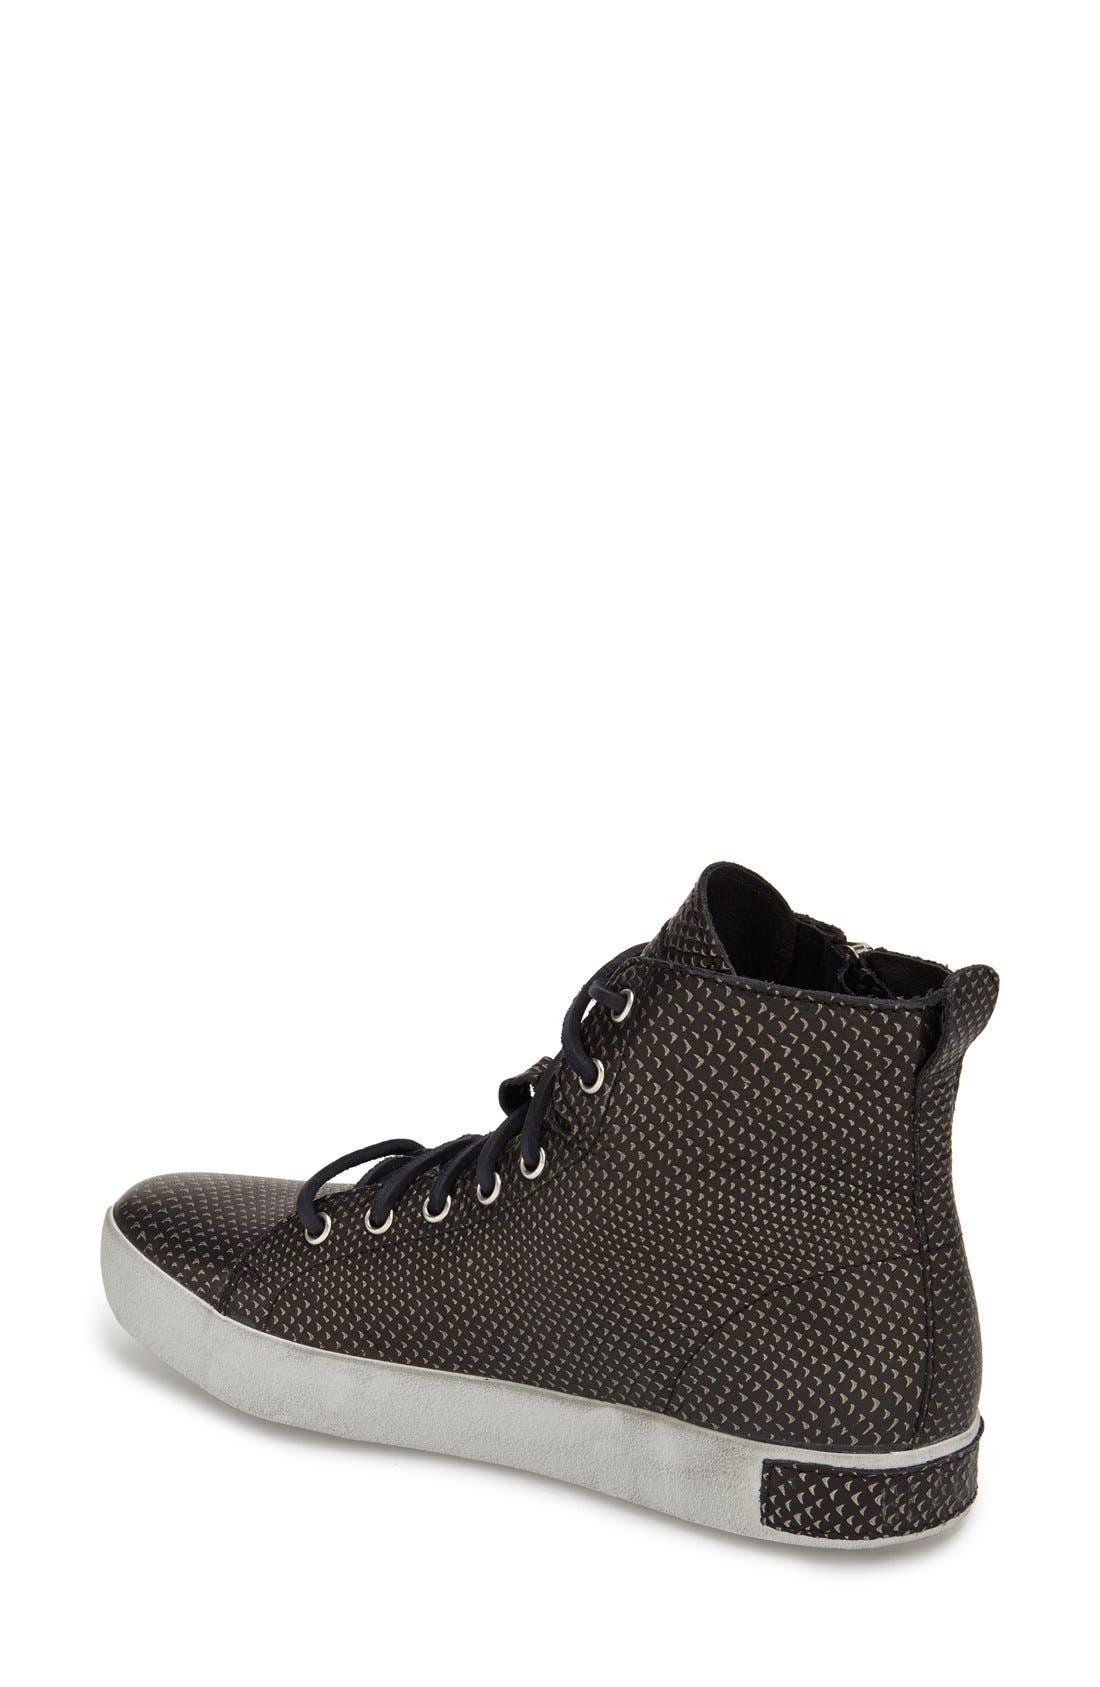 BLACKSTONE,                             'KL57' High Top Sneaker,                             Alternate thumbnail 2, color,                             006